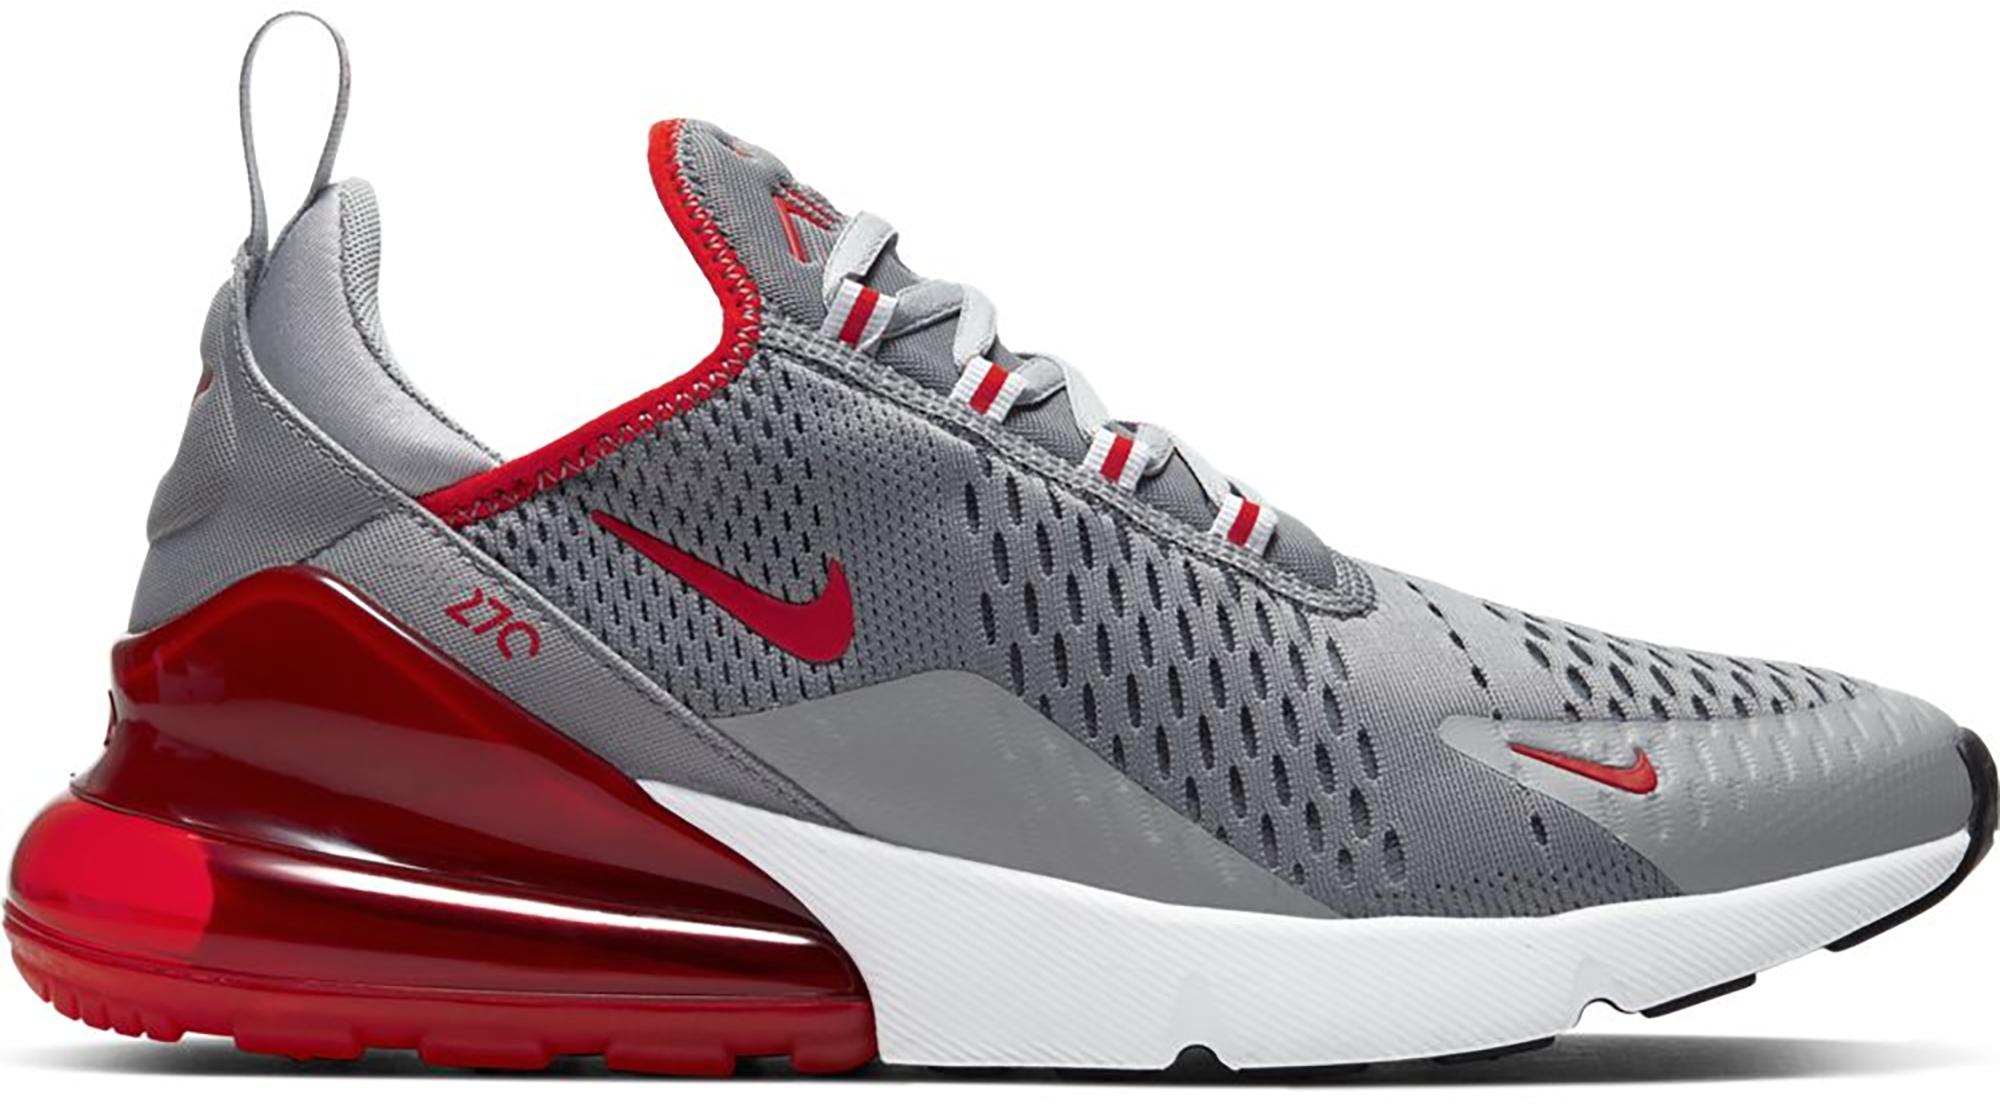 Nike Air Max 270 Particle Grey